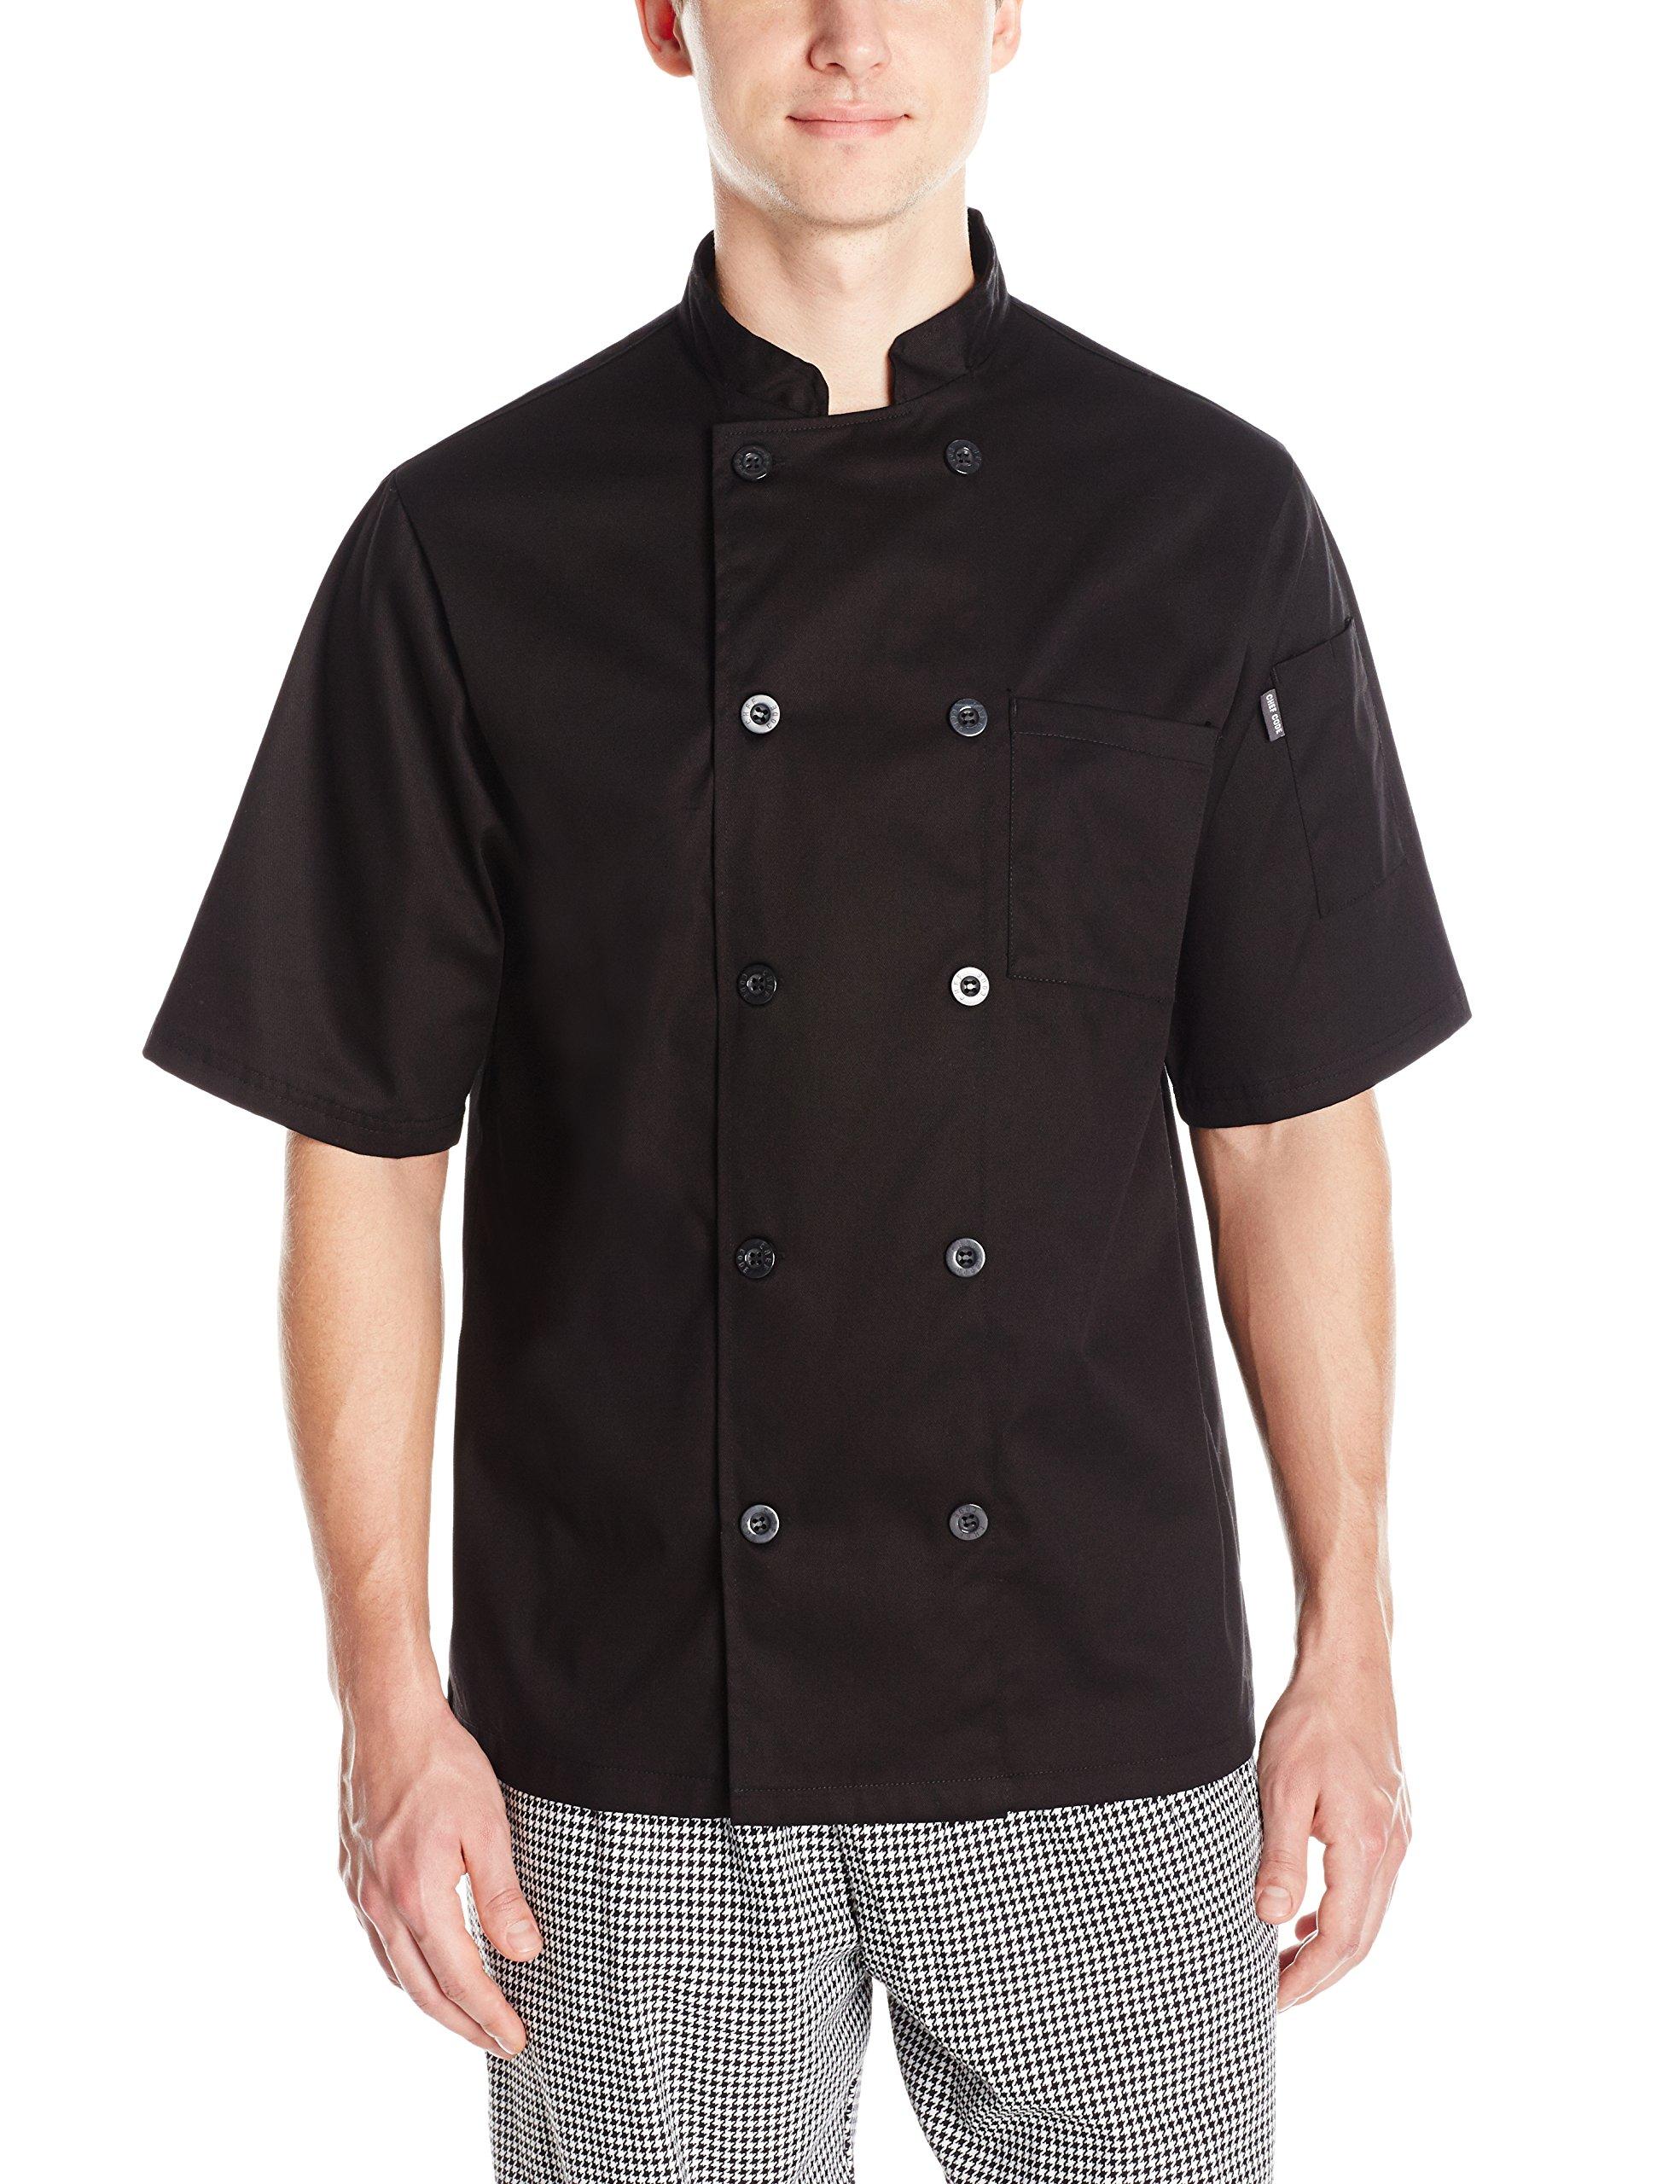 Chef Code Men's Short Sleeve Unisex Classic Chef Coat, Black, Medium by Chef Code